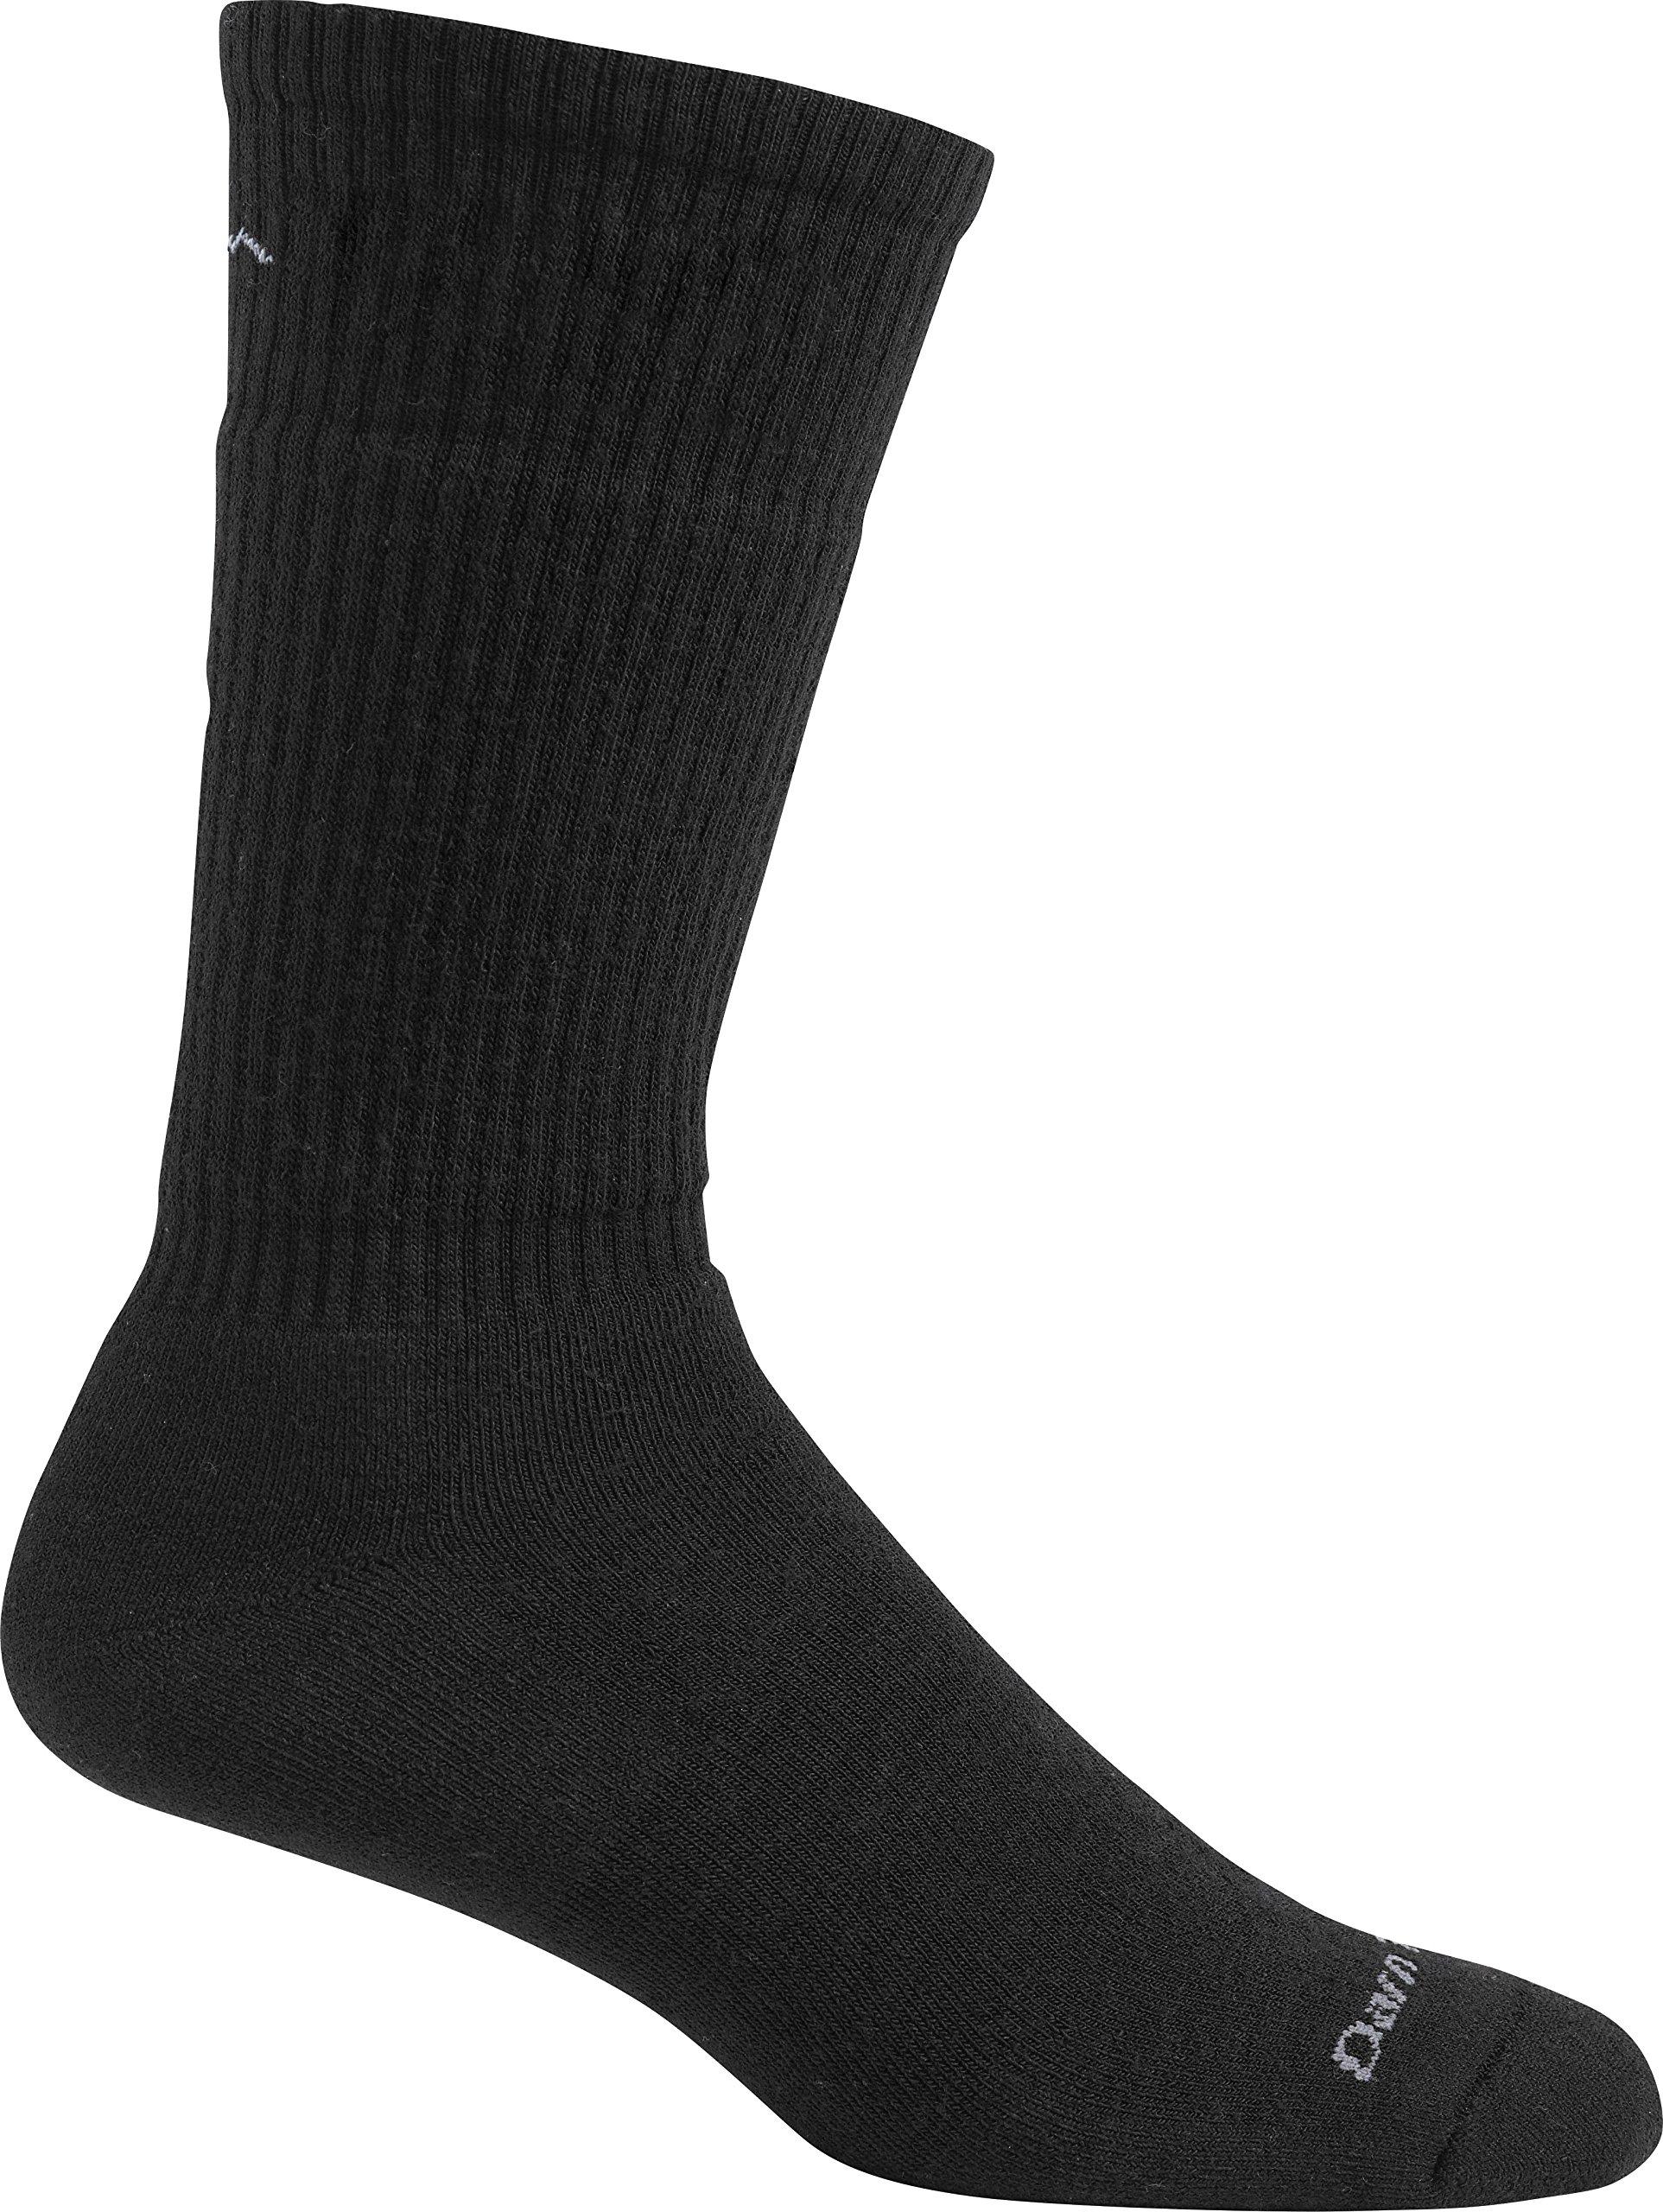 Darn Tough Standard Issue Mid Calf Light Sock,  Black,  X-Large / 12.5-14.5